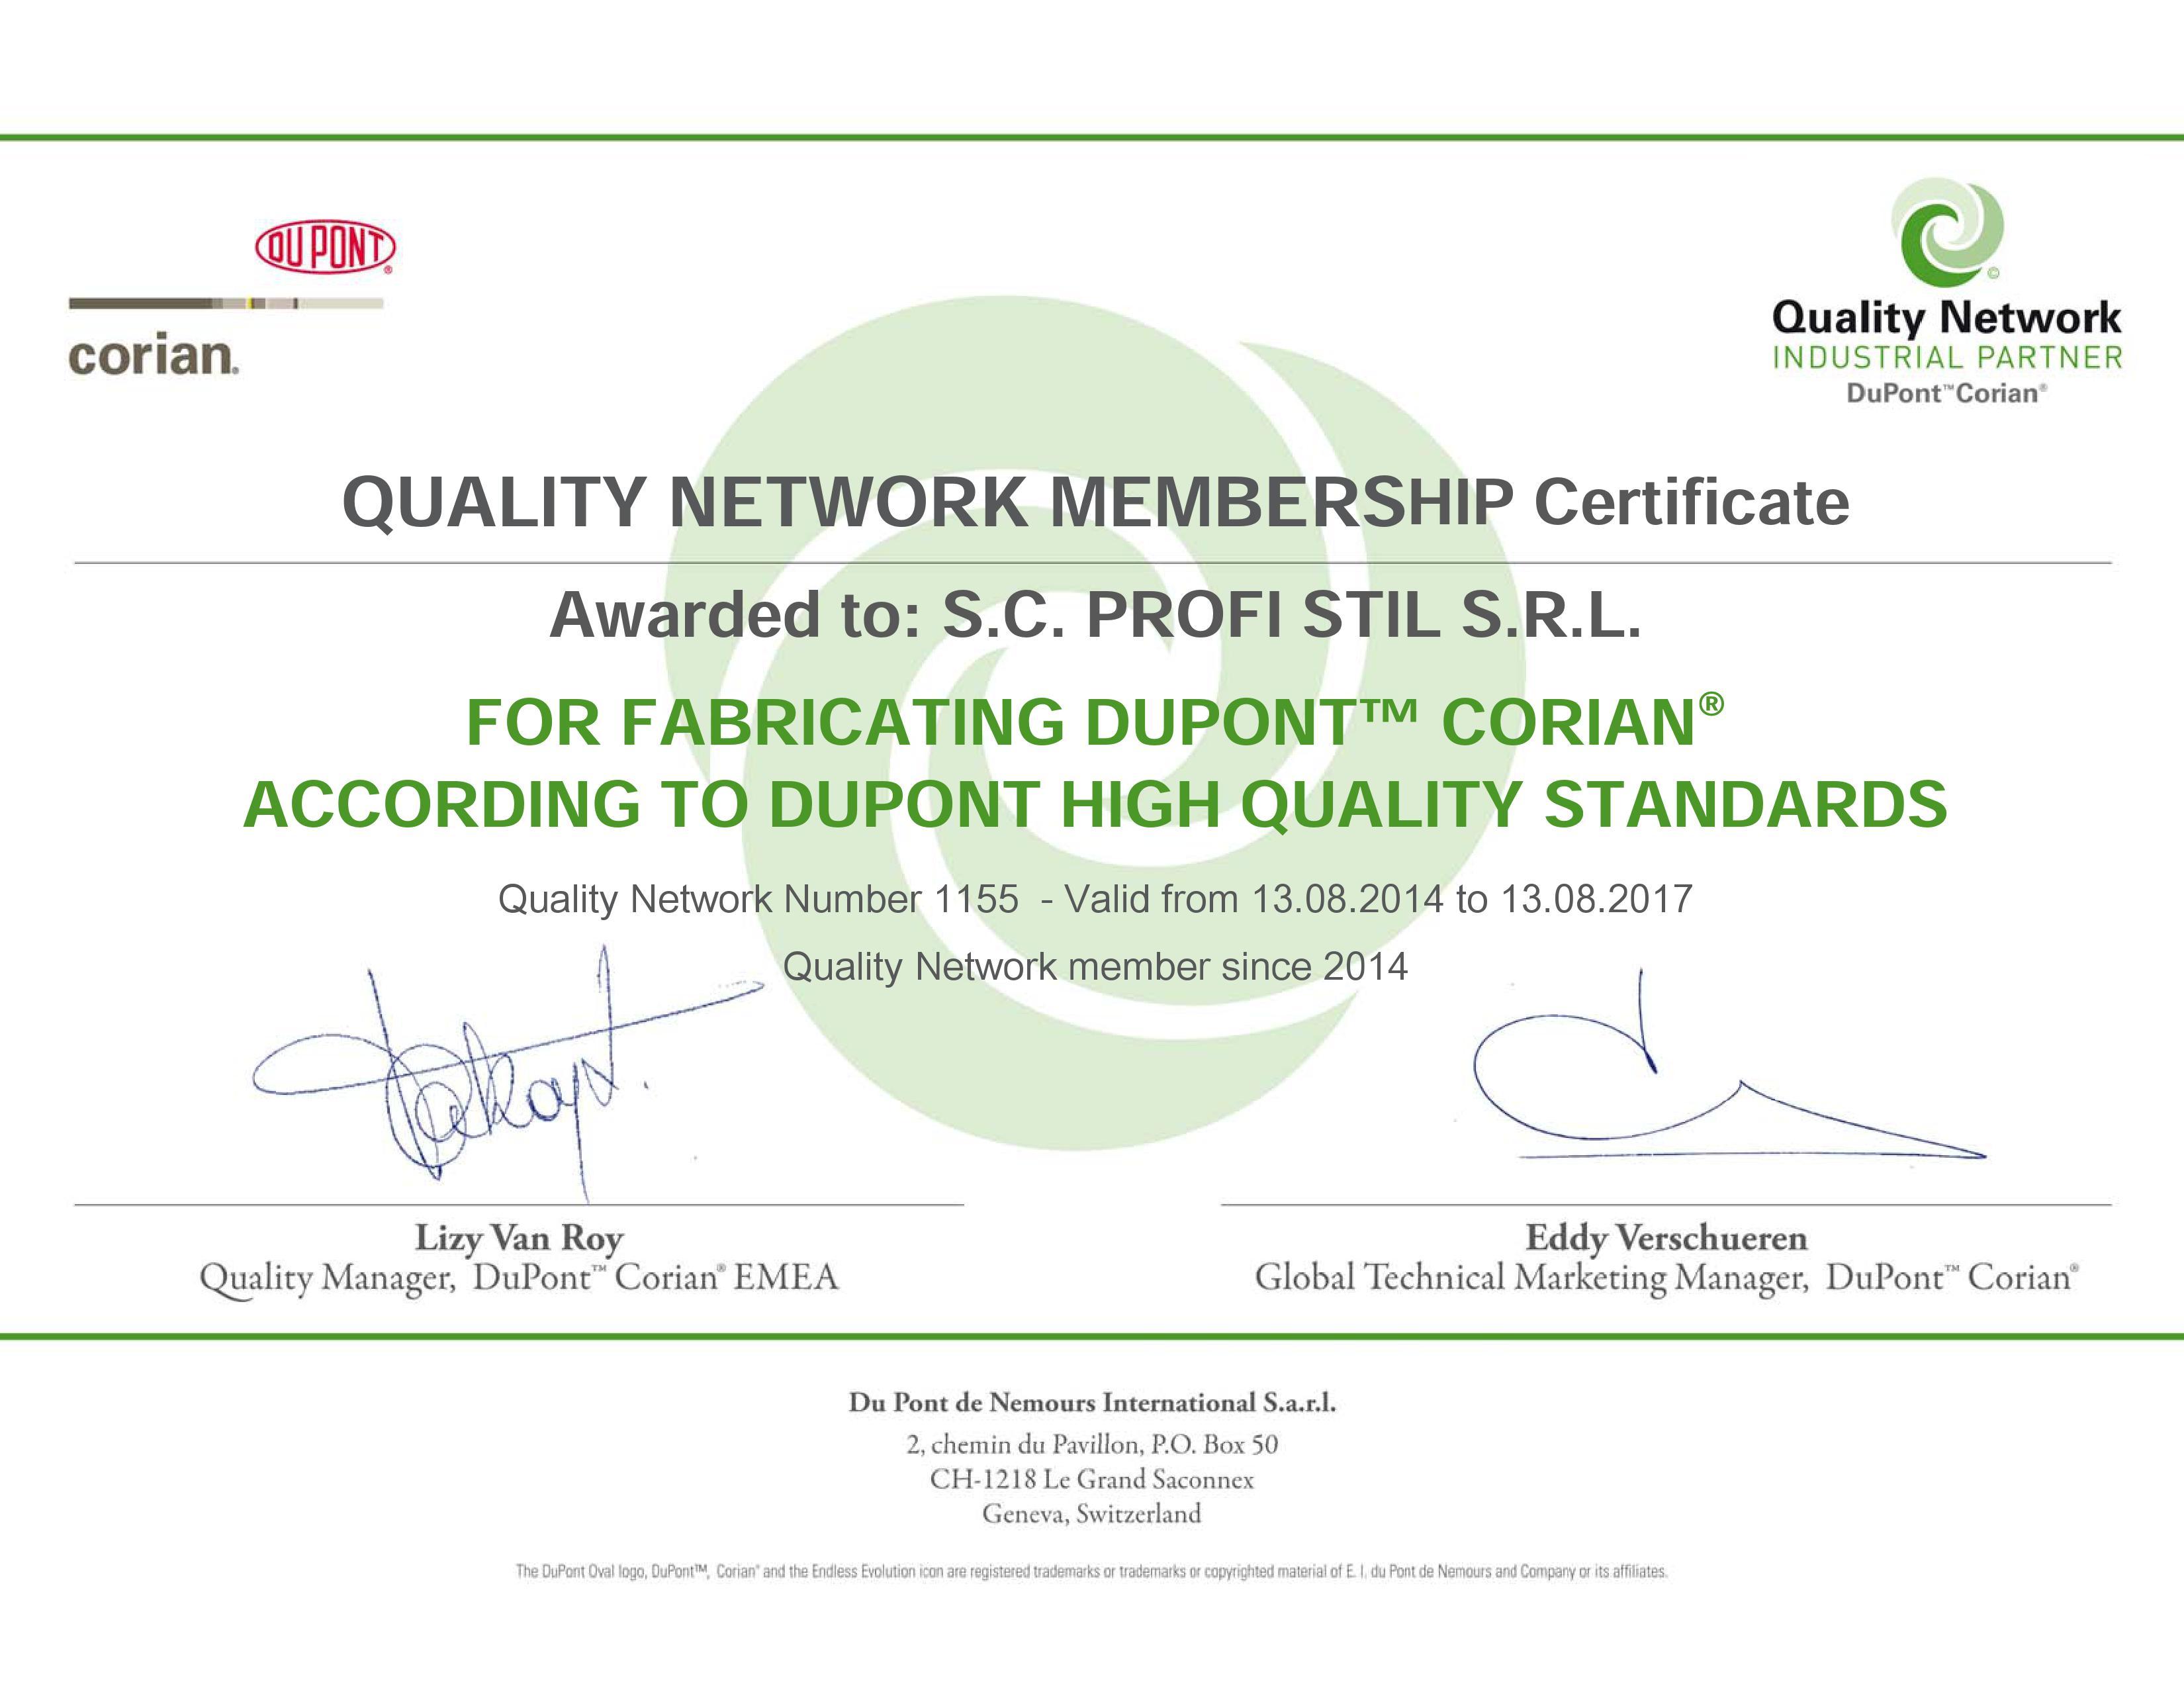 QN-2014-RO-S.C. PROFI STIL S.R.L-Certificate